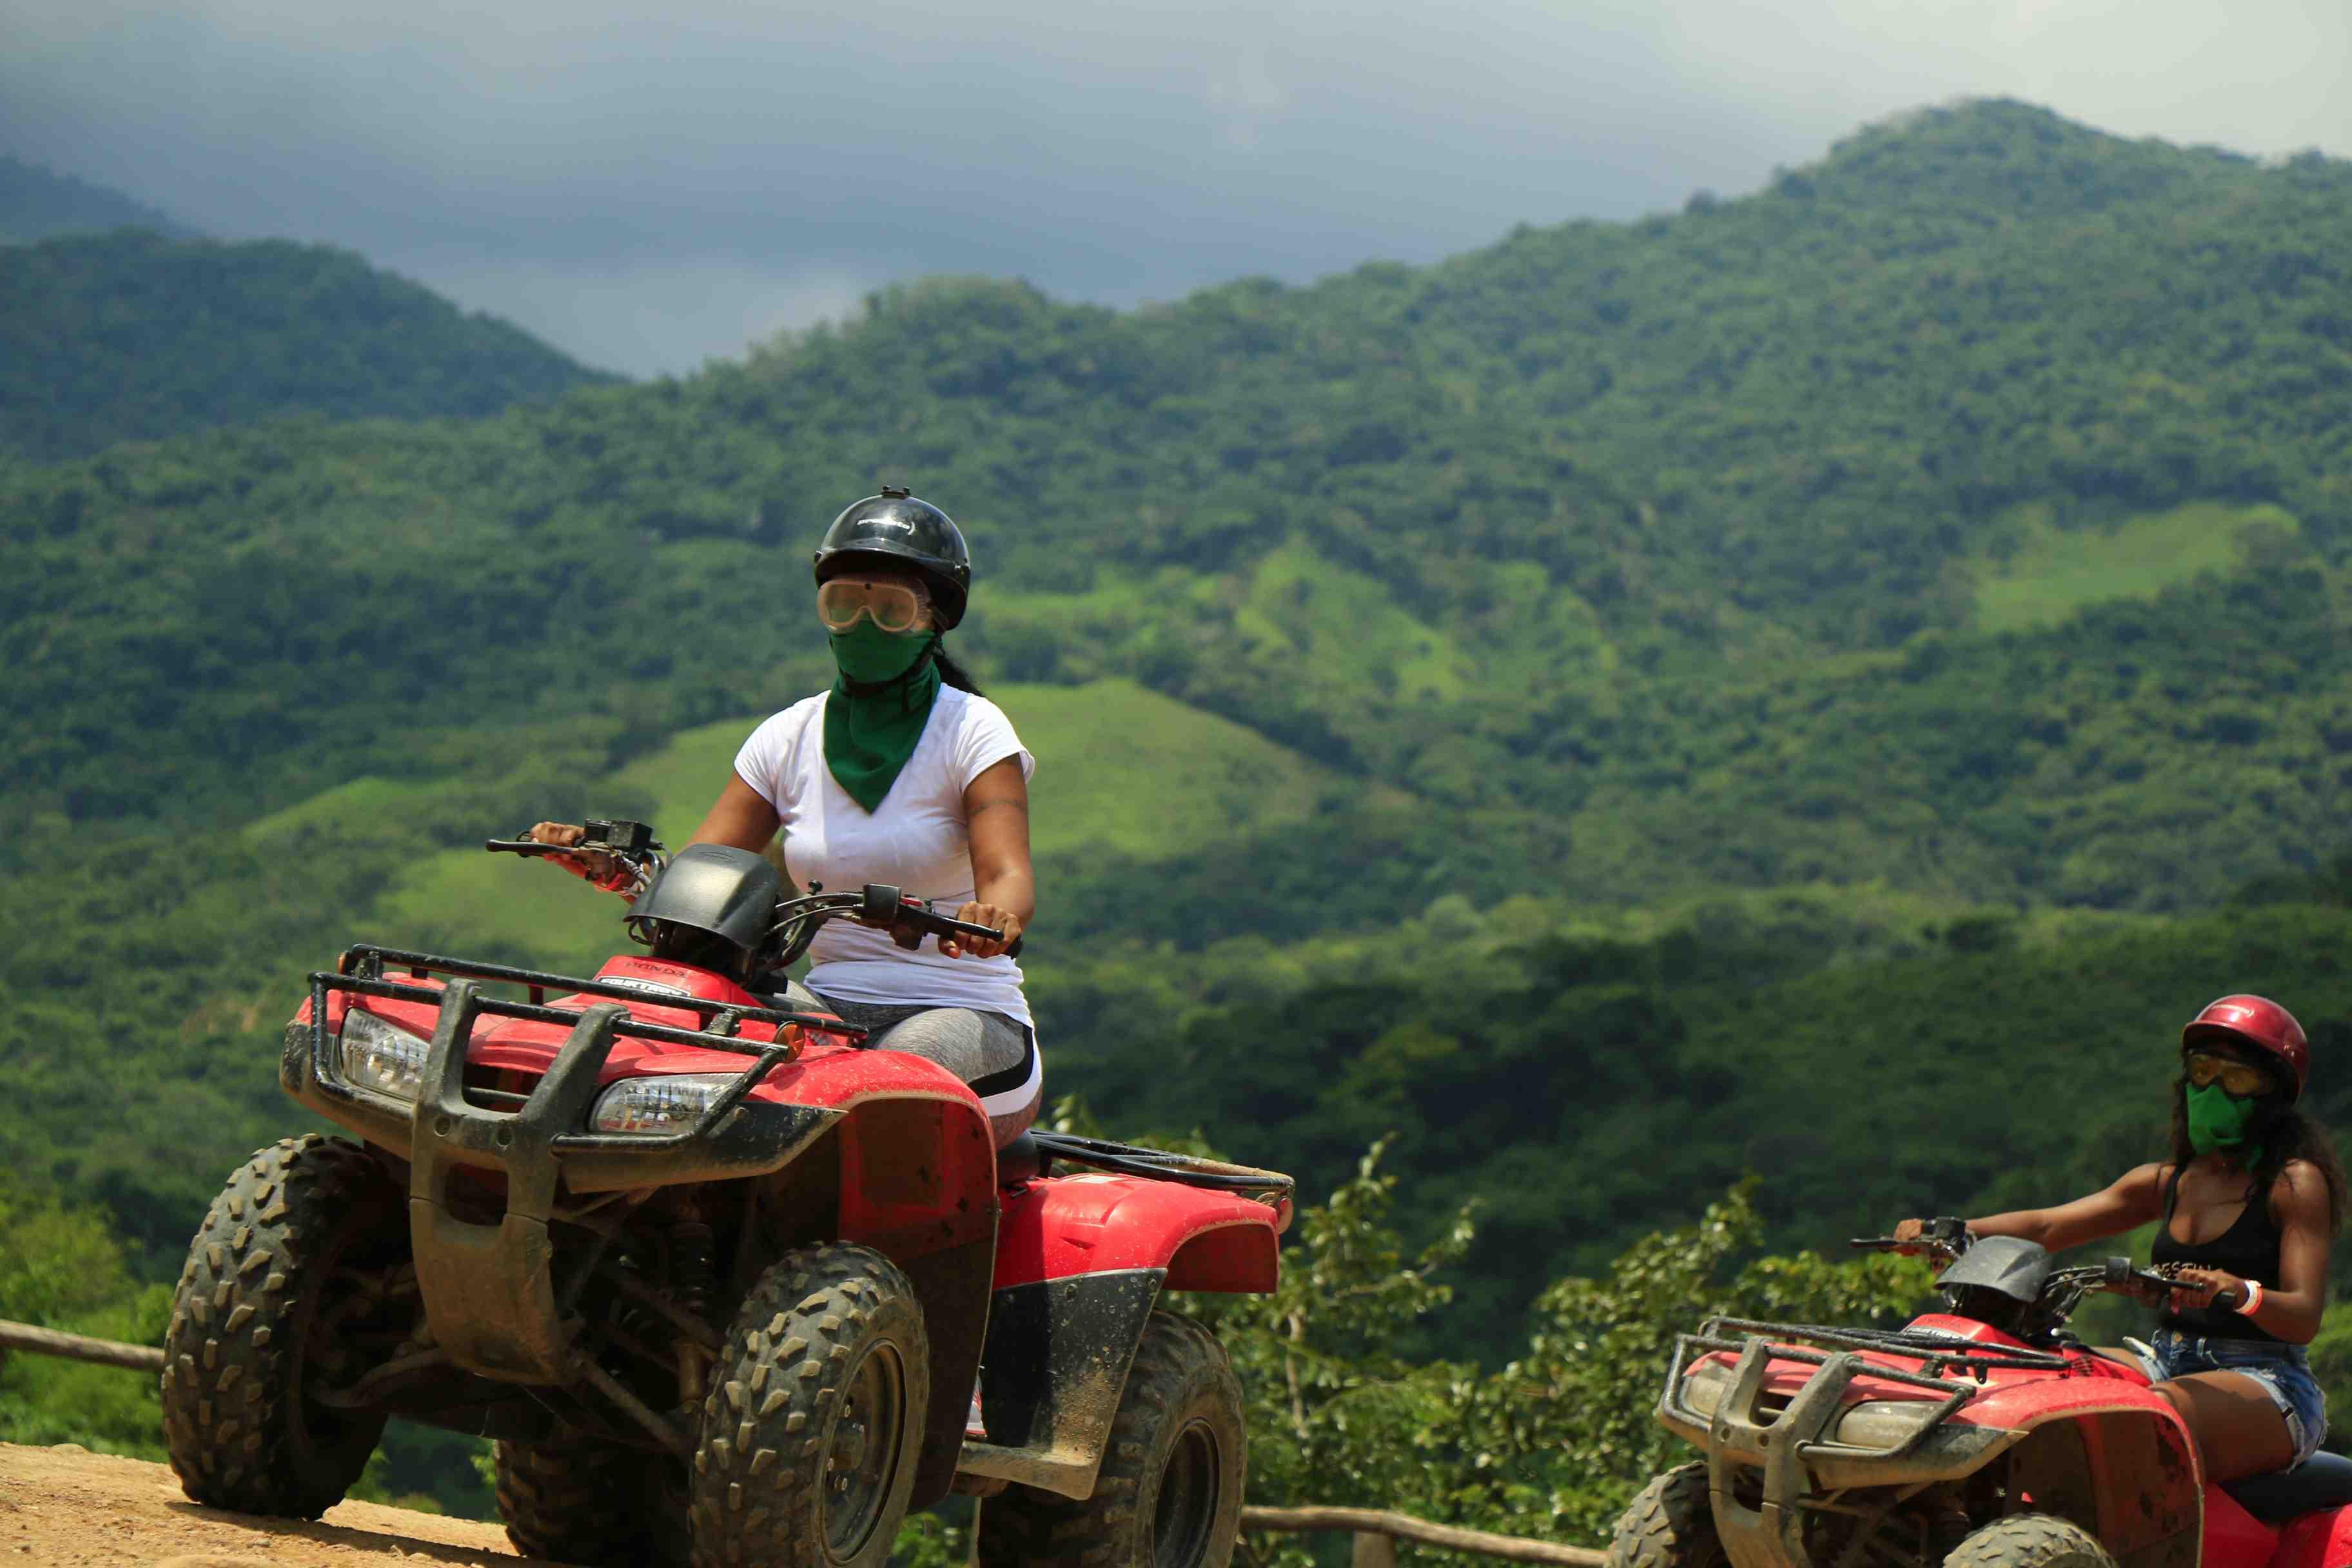 Single Atv - River Route - Last Minute Tours in Puerto Vallarta